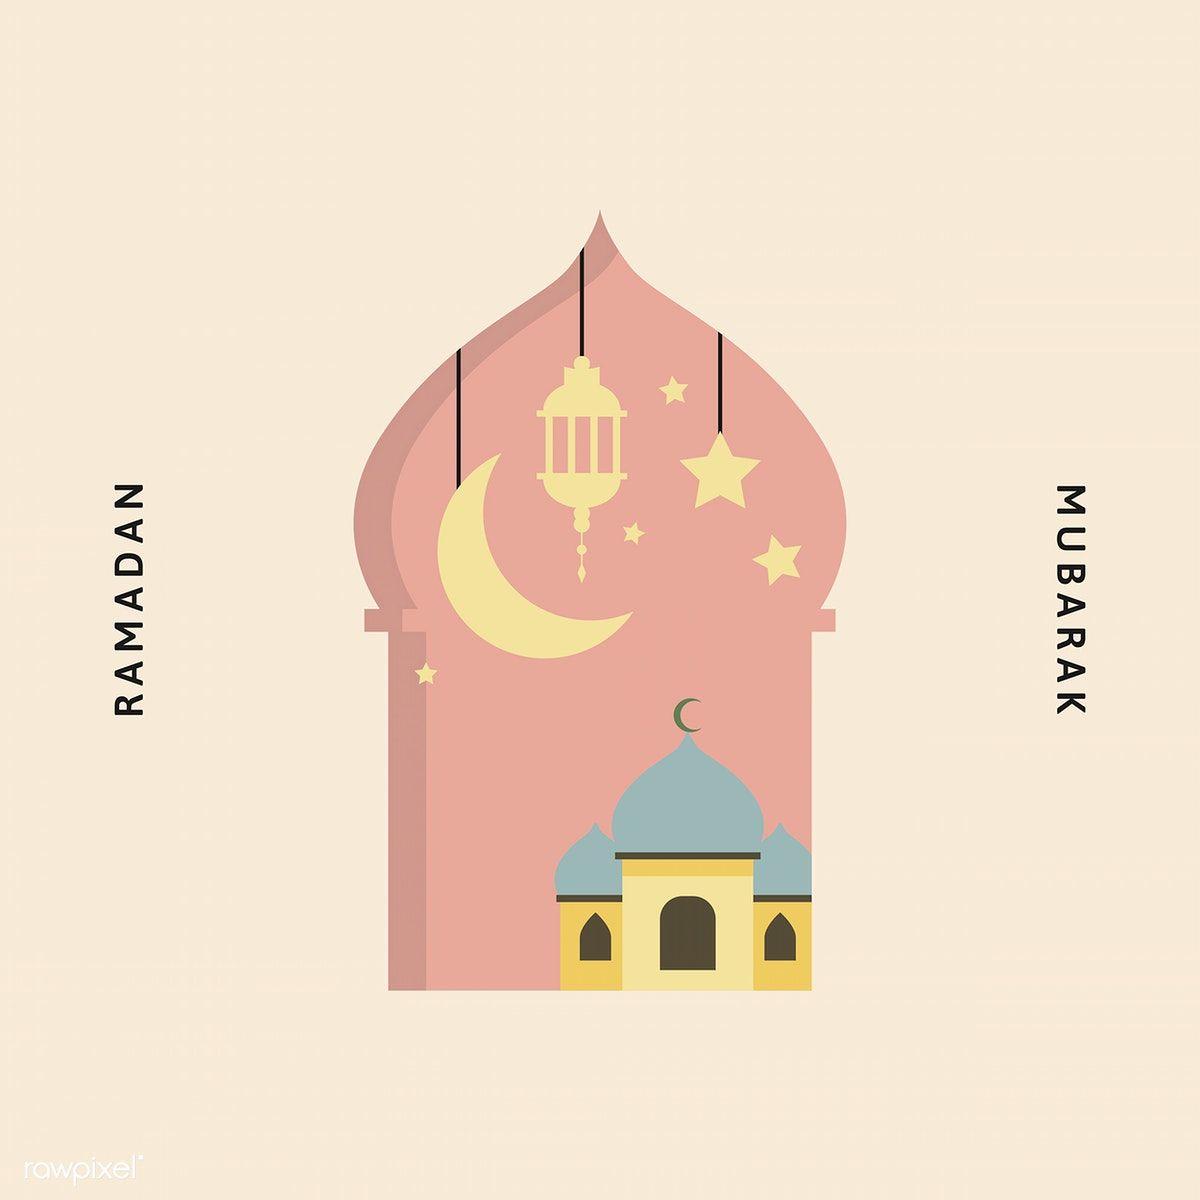 Ramadan Mubarak Card With Mosque Vector Free Image By Rawpixel